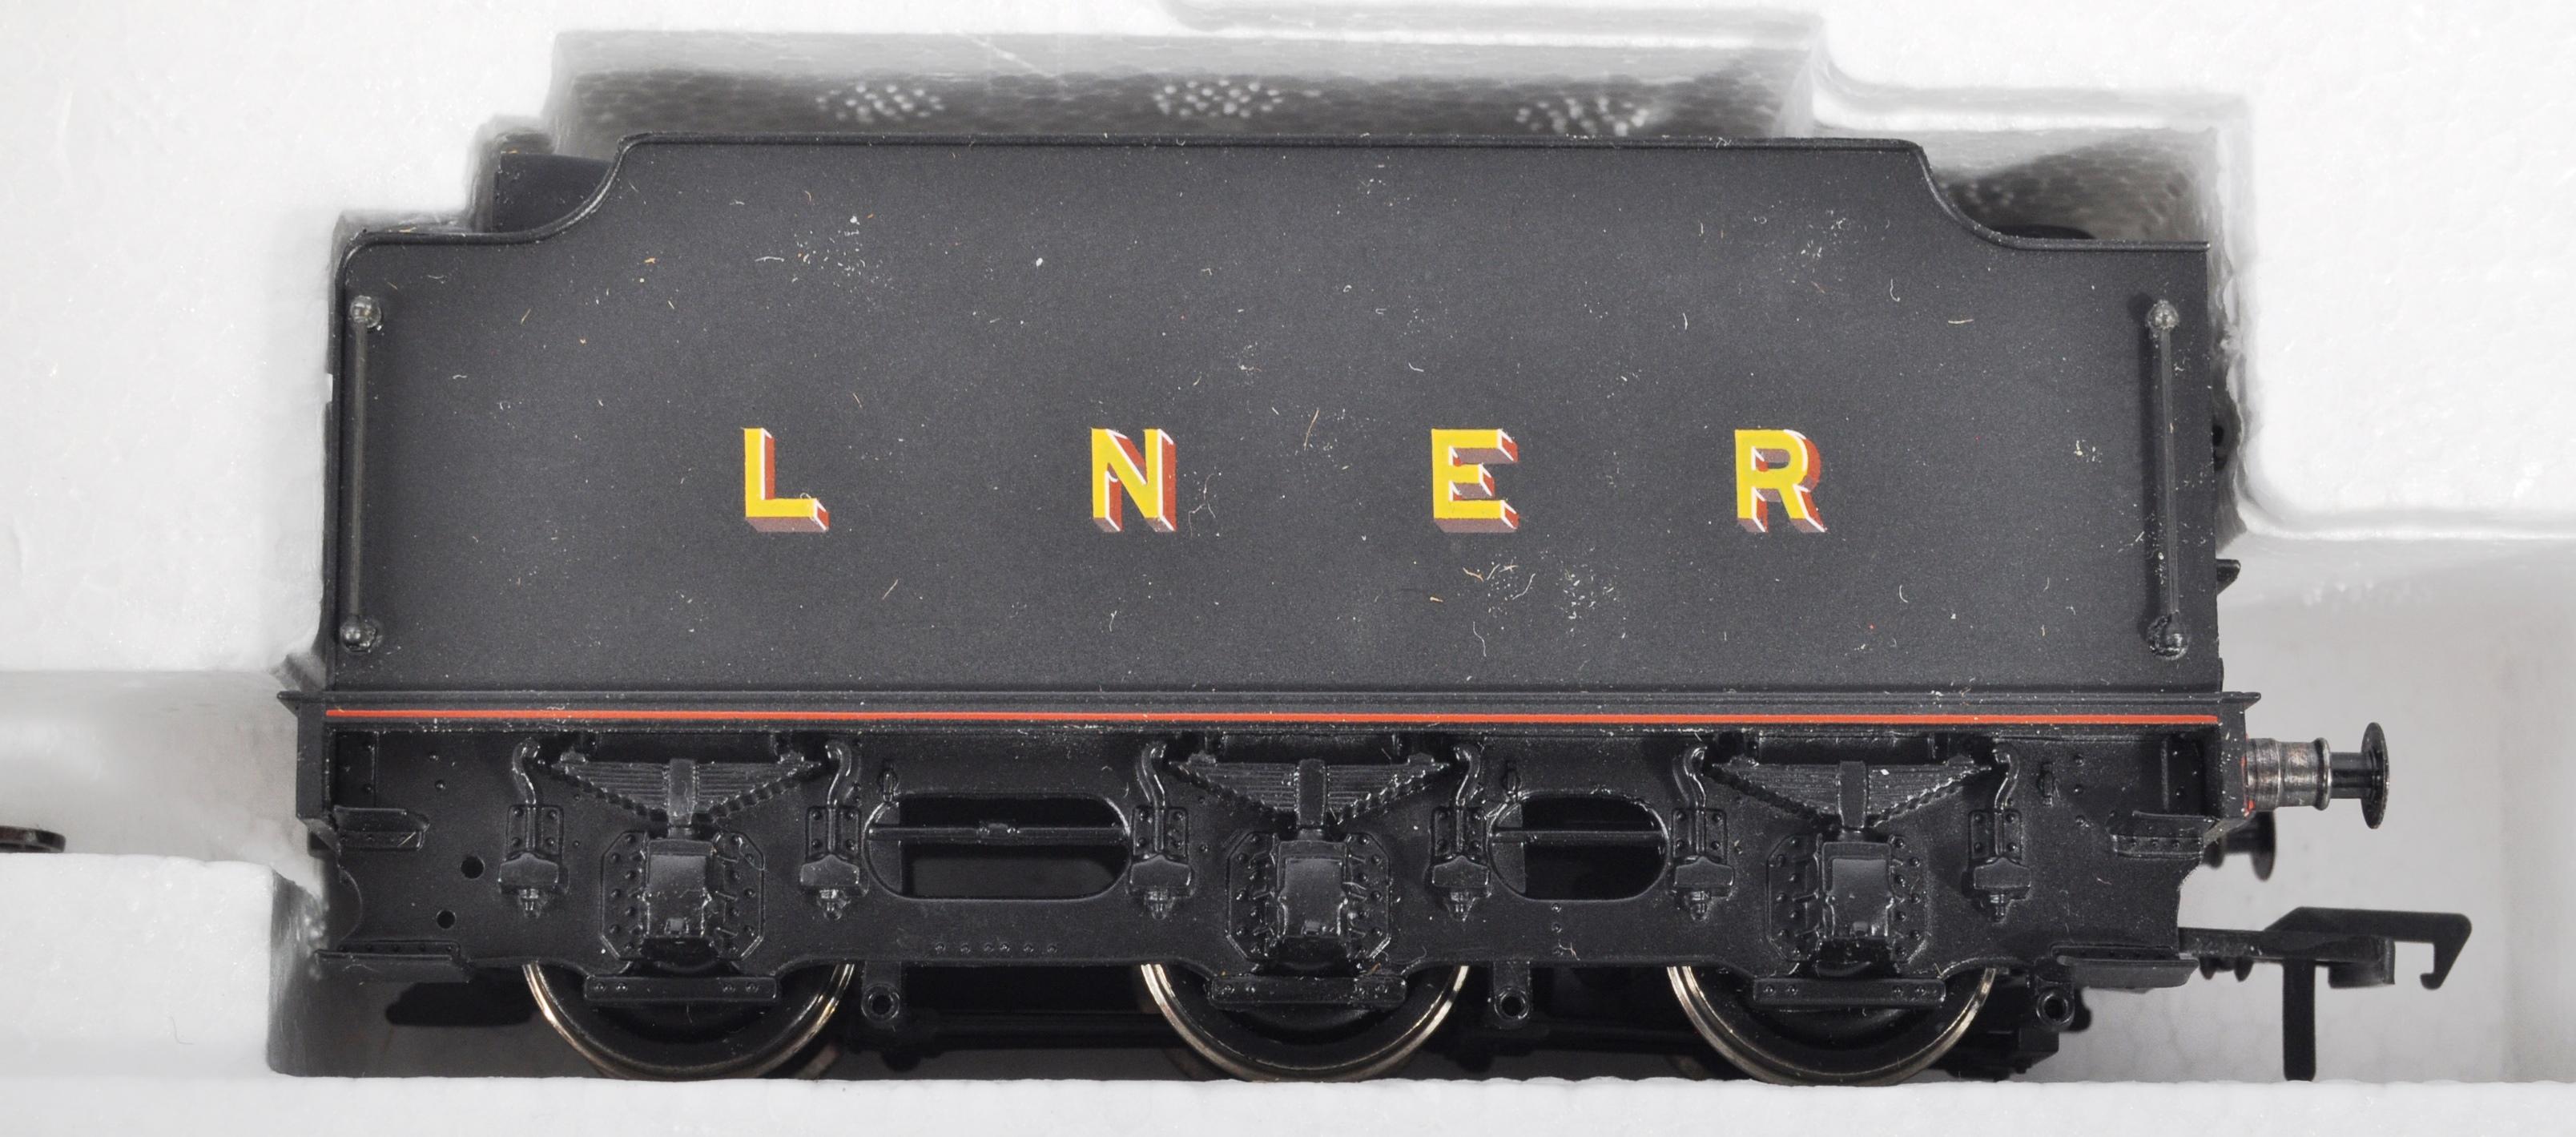 ORIGINAL BACHMANN BRANCH LINE 00 GAUGE MODEL RAILWAY LOCOMOTIVE - Image 4 of 5